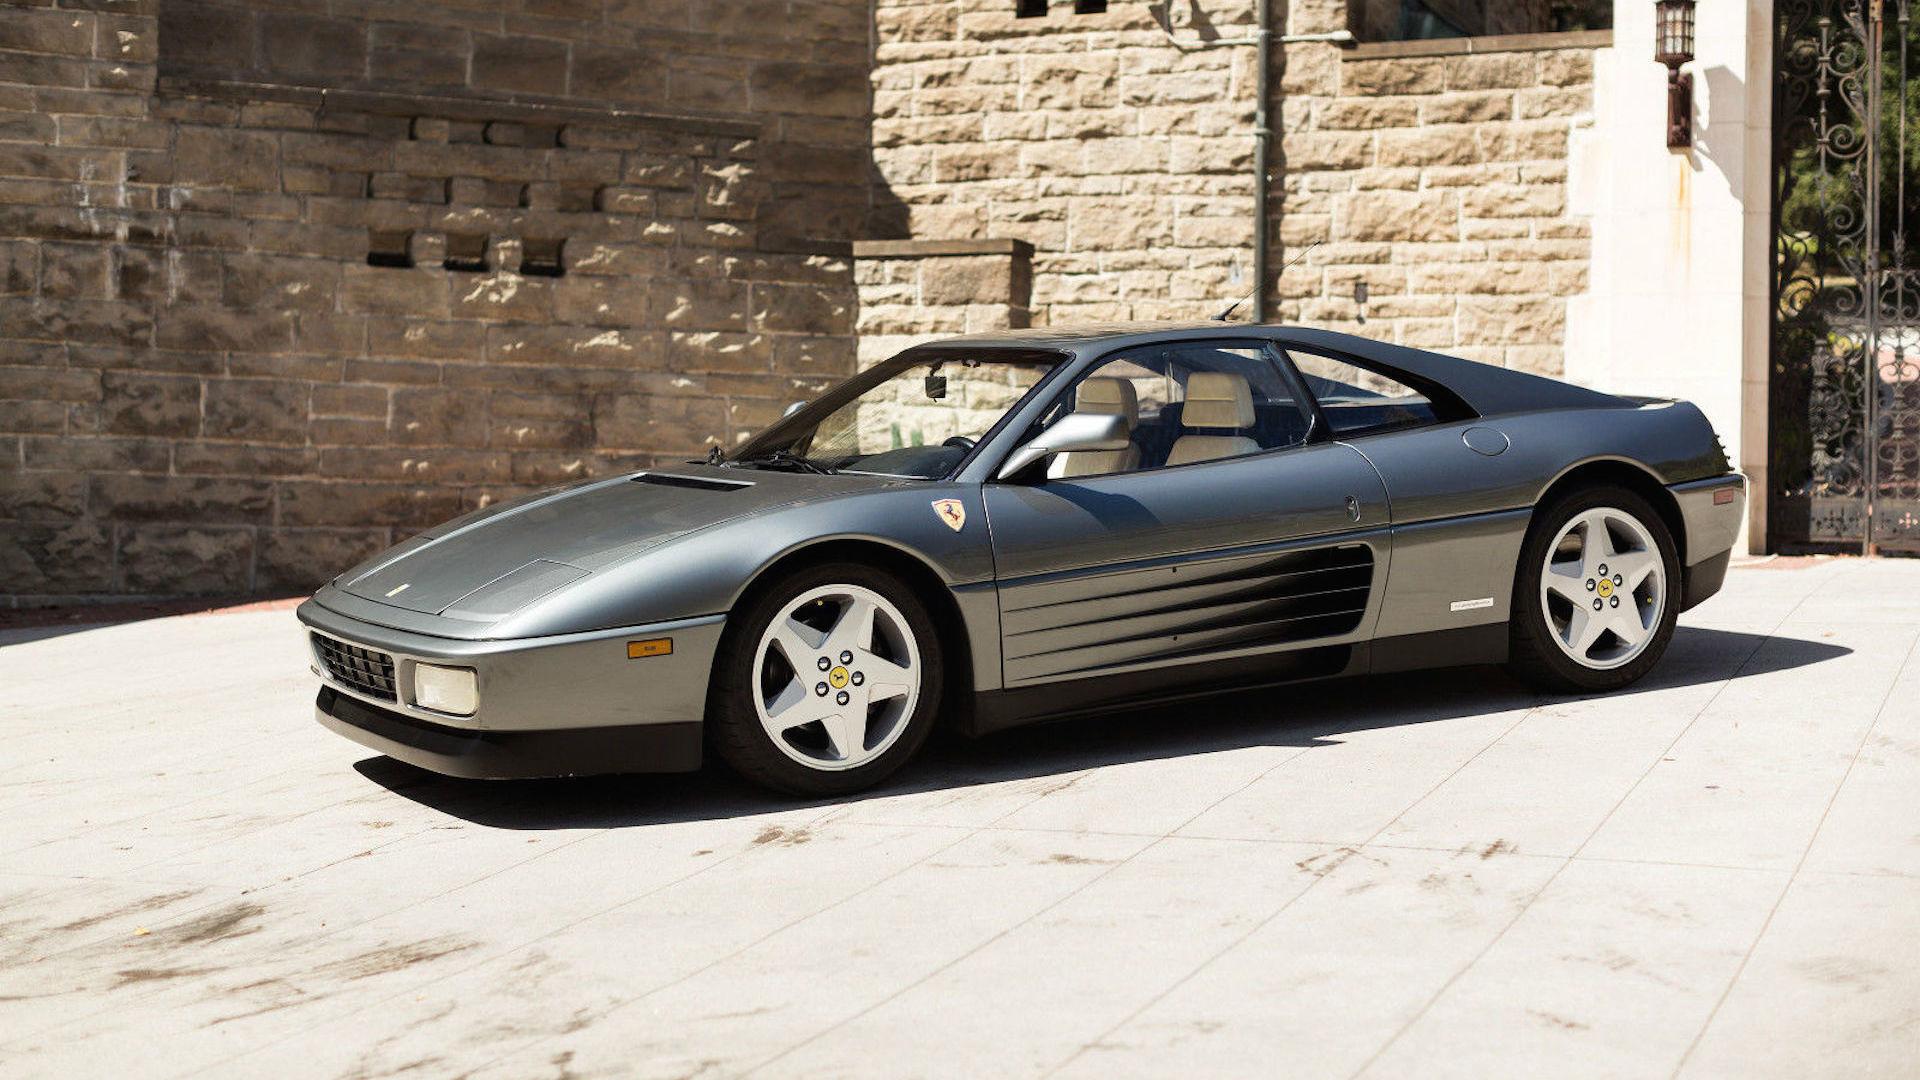 1990-ferrari-348-tb-coupe-ebay.jpg